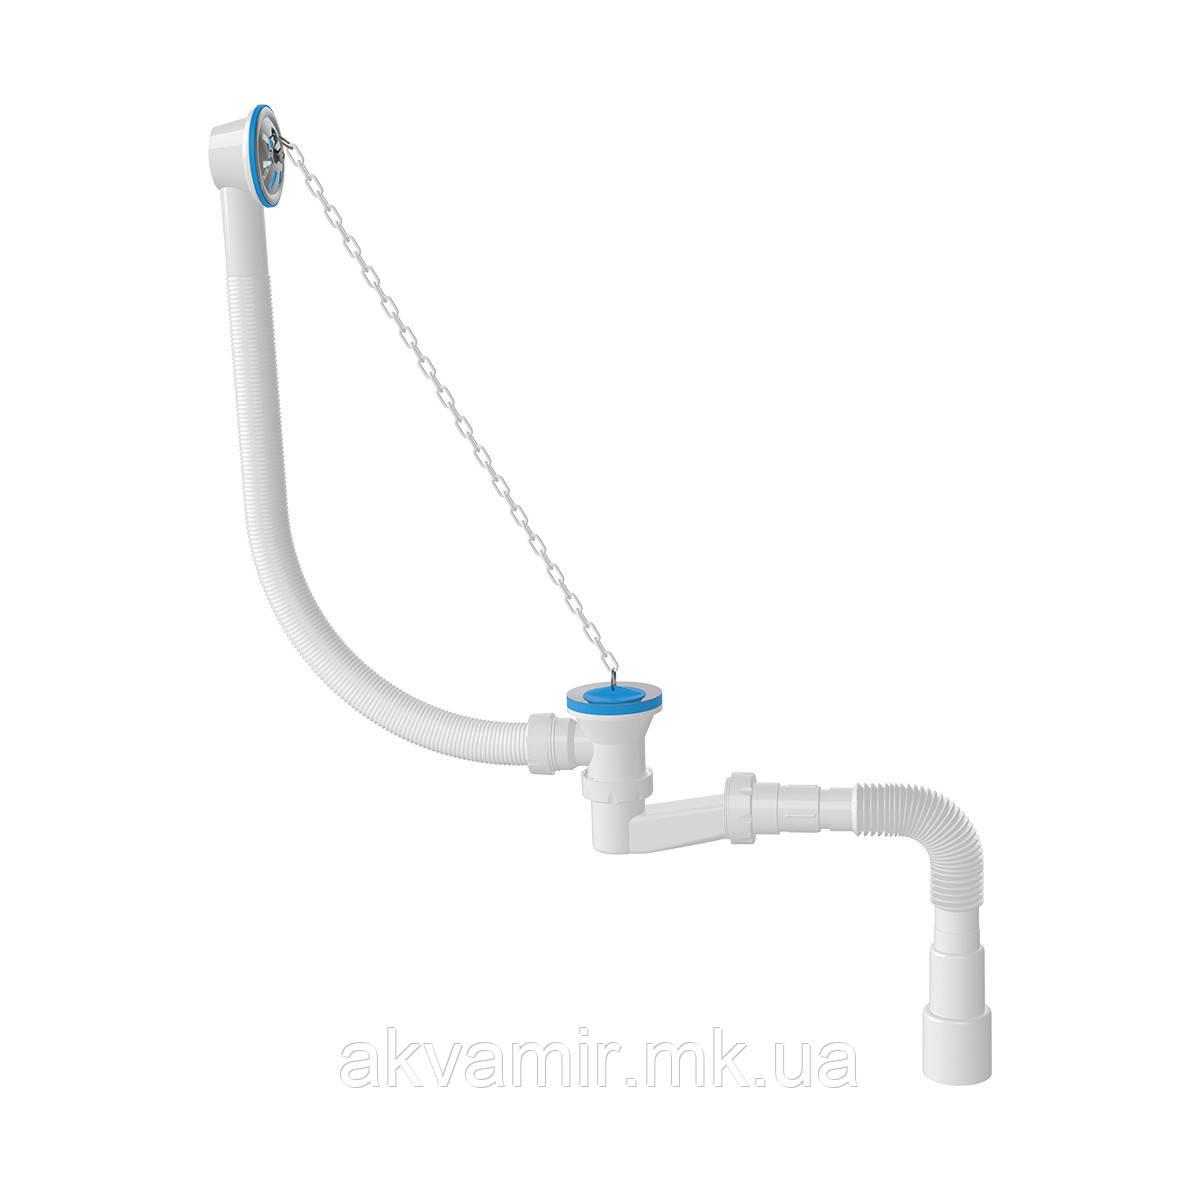 Сифон для ванны низкий 1521N (Турция)